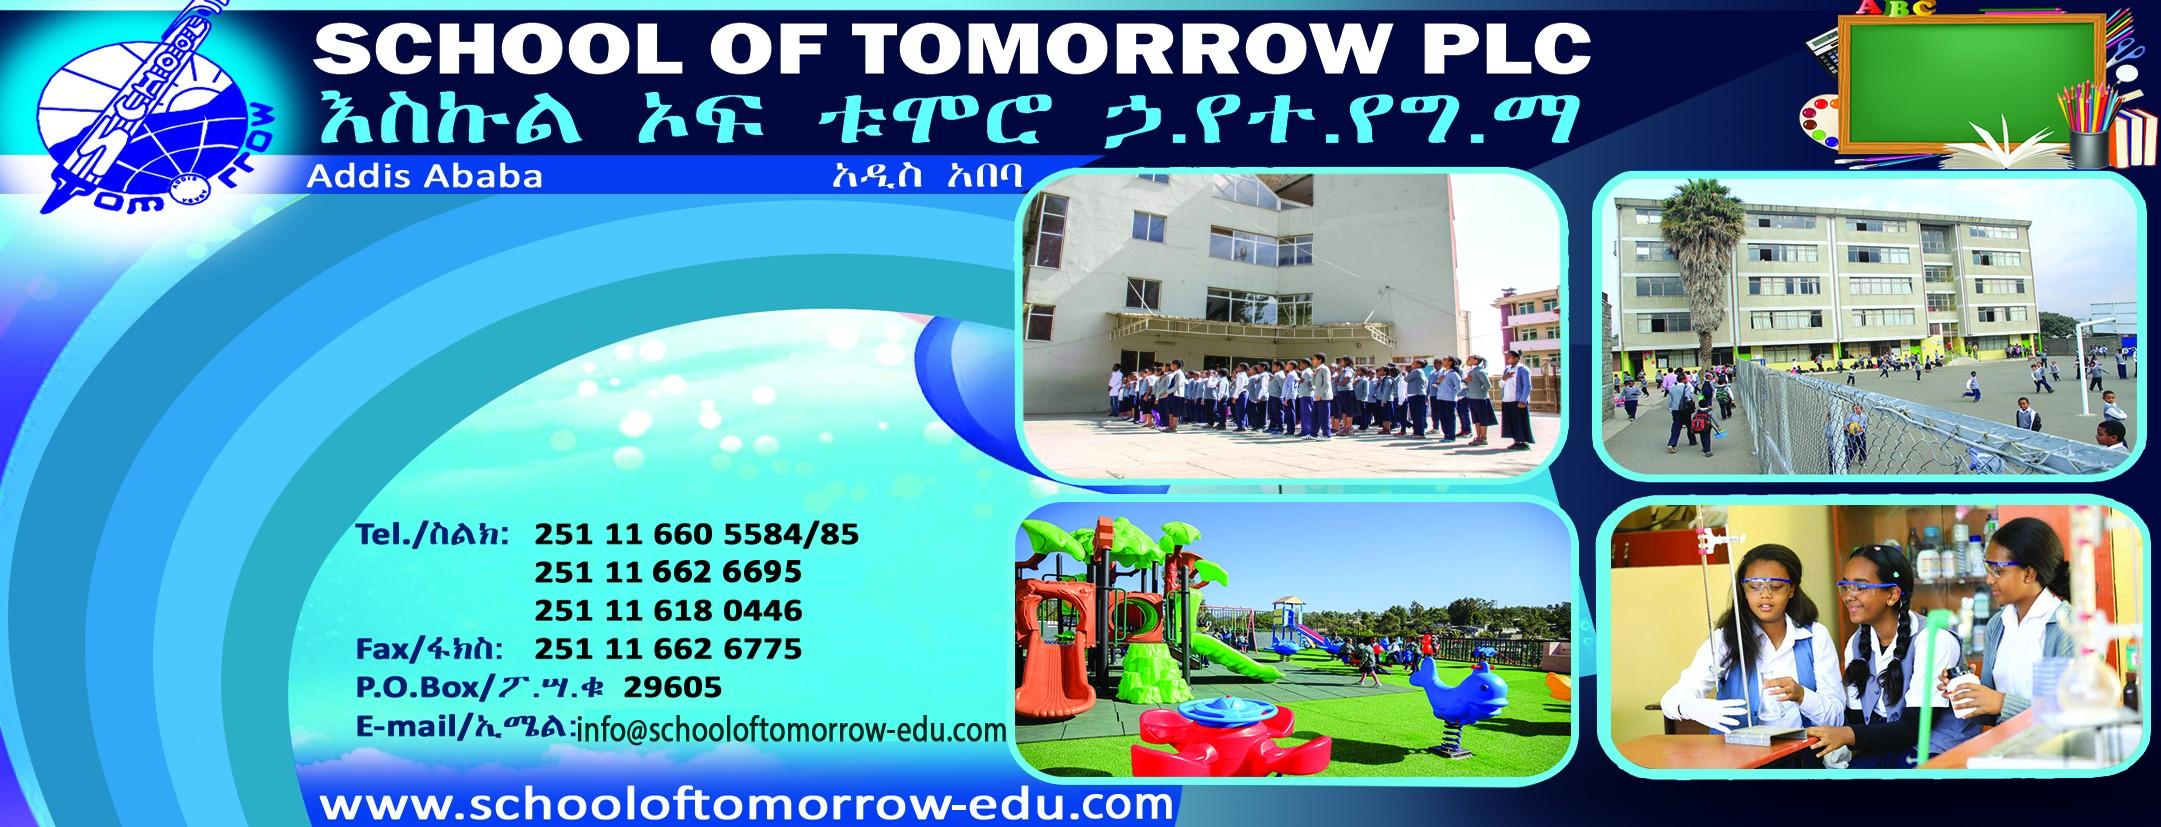 School of Tomorrow PLC - Mega Branch